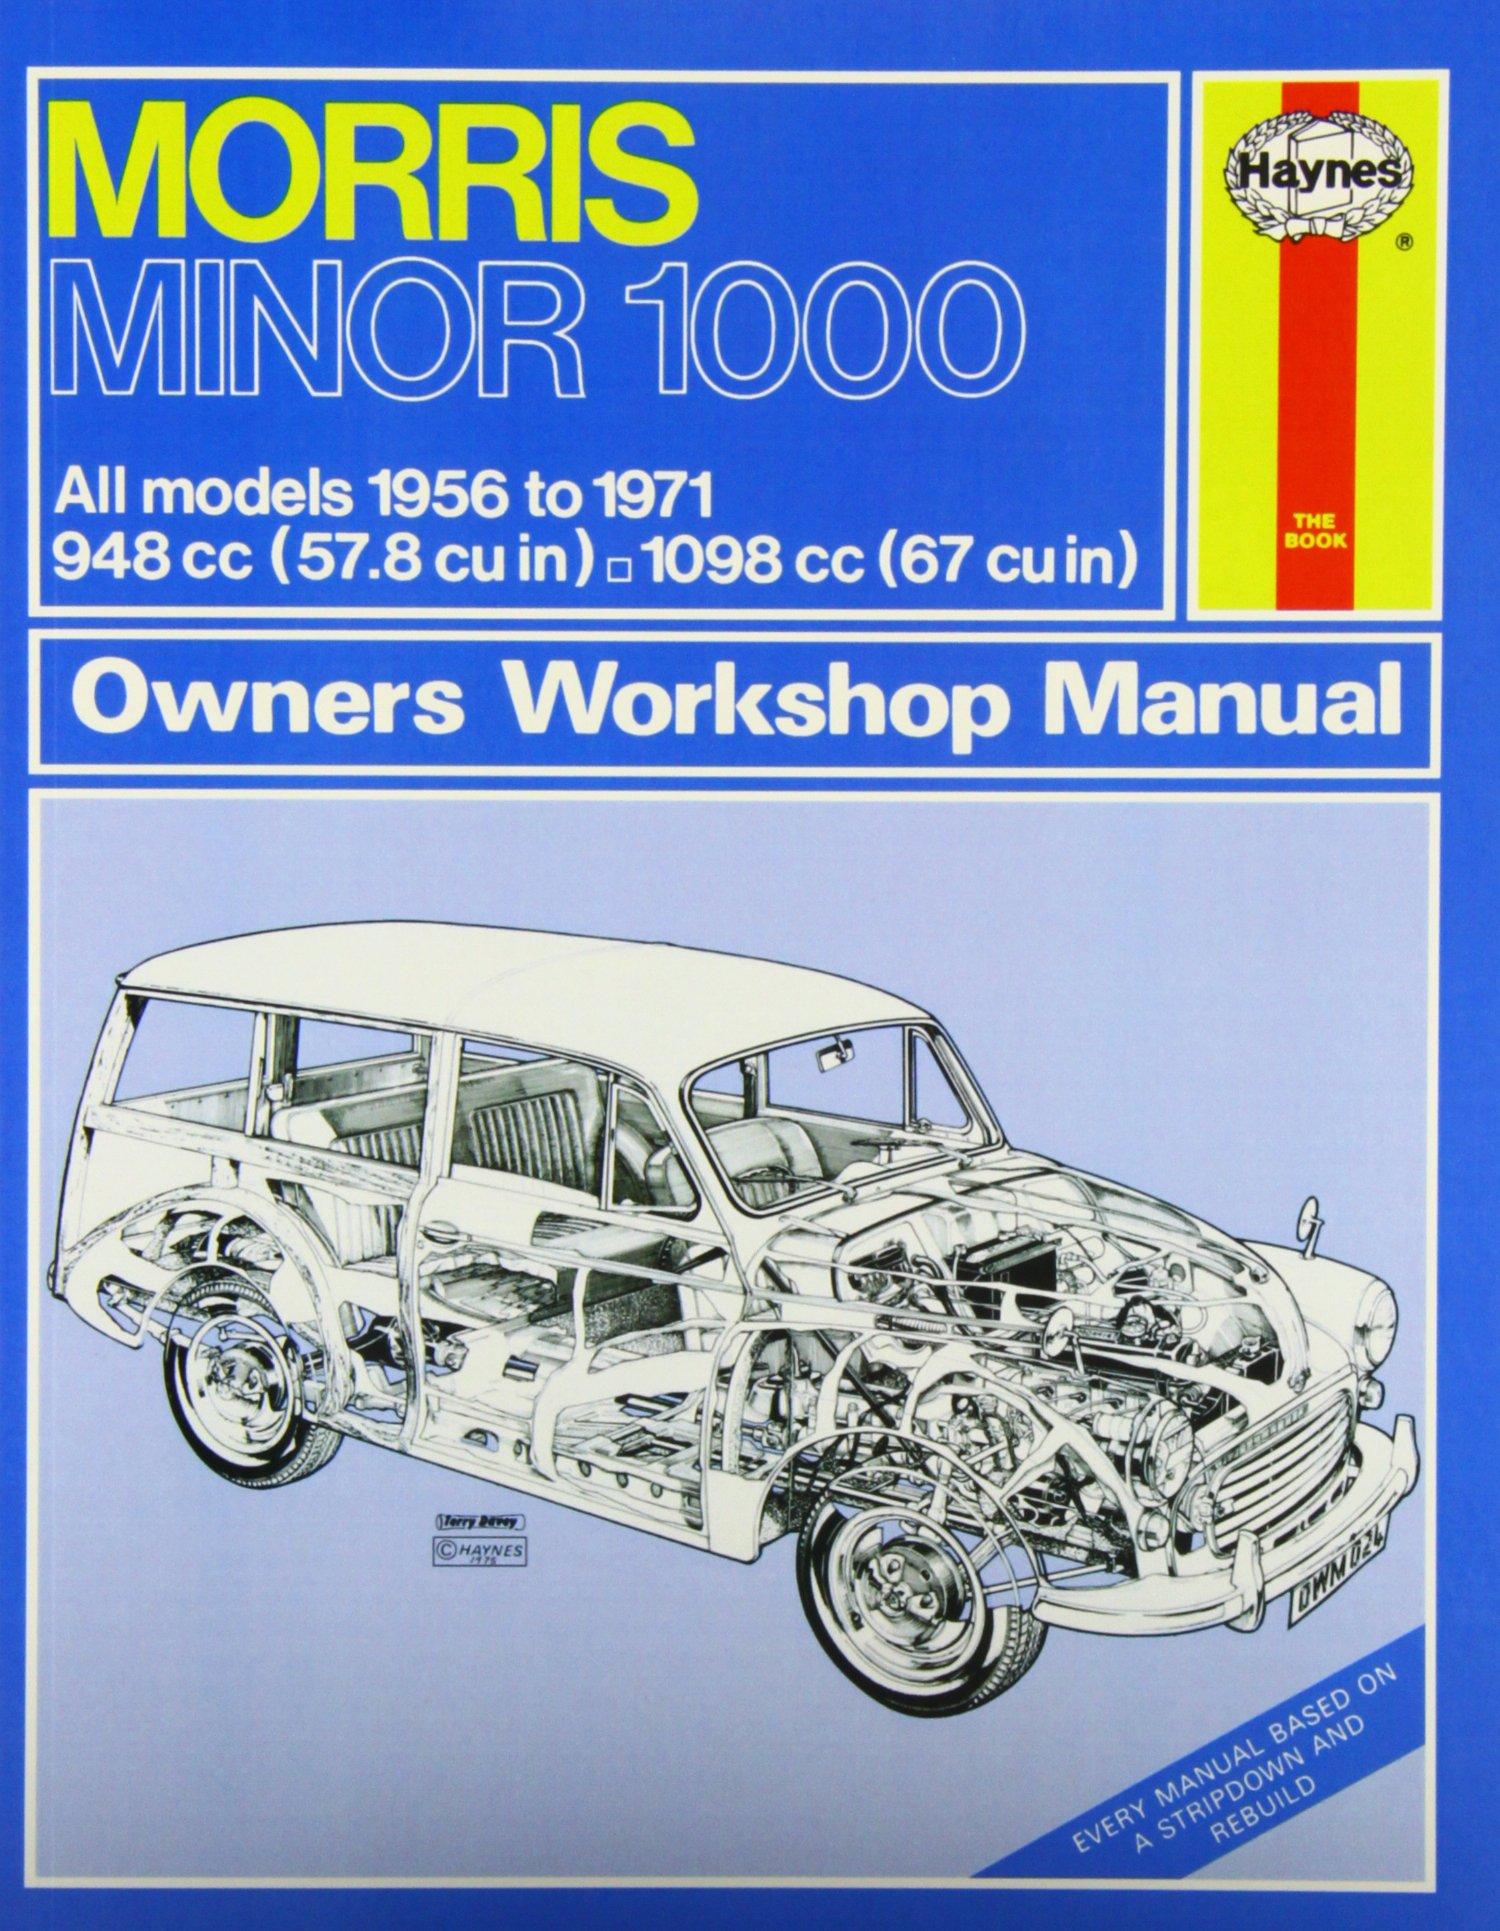 Morris Minor 1000 Owner's Workshop Manual: Haynes: 0038345000249:  Amazon.com: Books